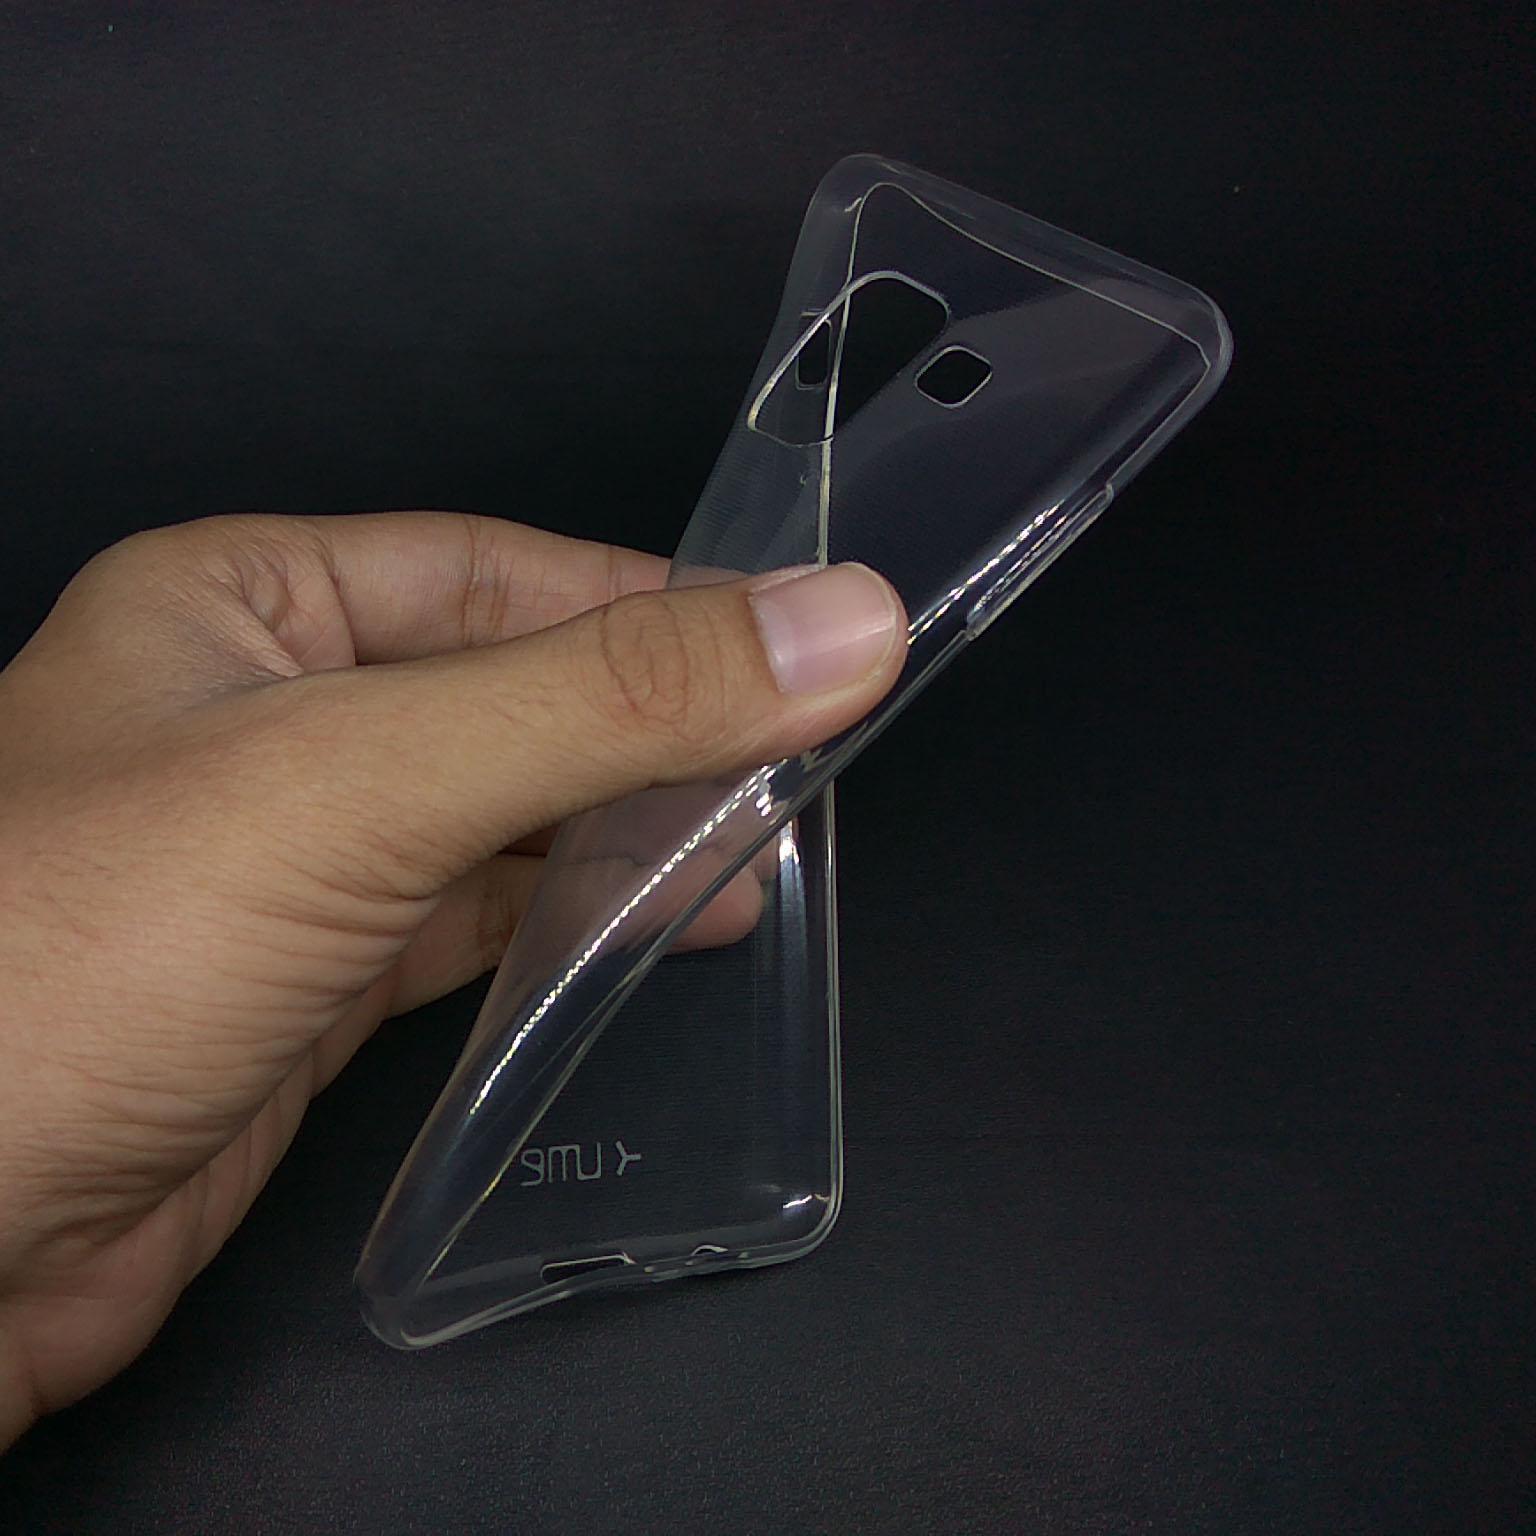 Fitur Ultrathin Softcase Ume Tpu Samsung Galaxy A8 Plus 2018 Casing Silikon Transparan For Asus Zenfone 2 Detail Gambar Ultra Thin Soft Case Silicone Terbaru